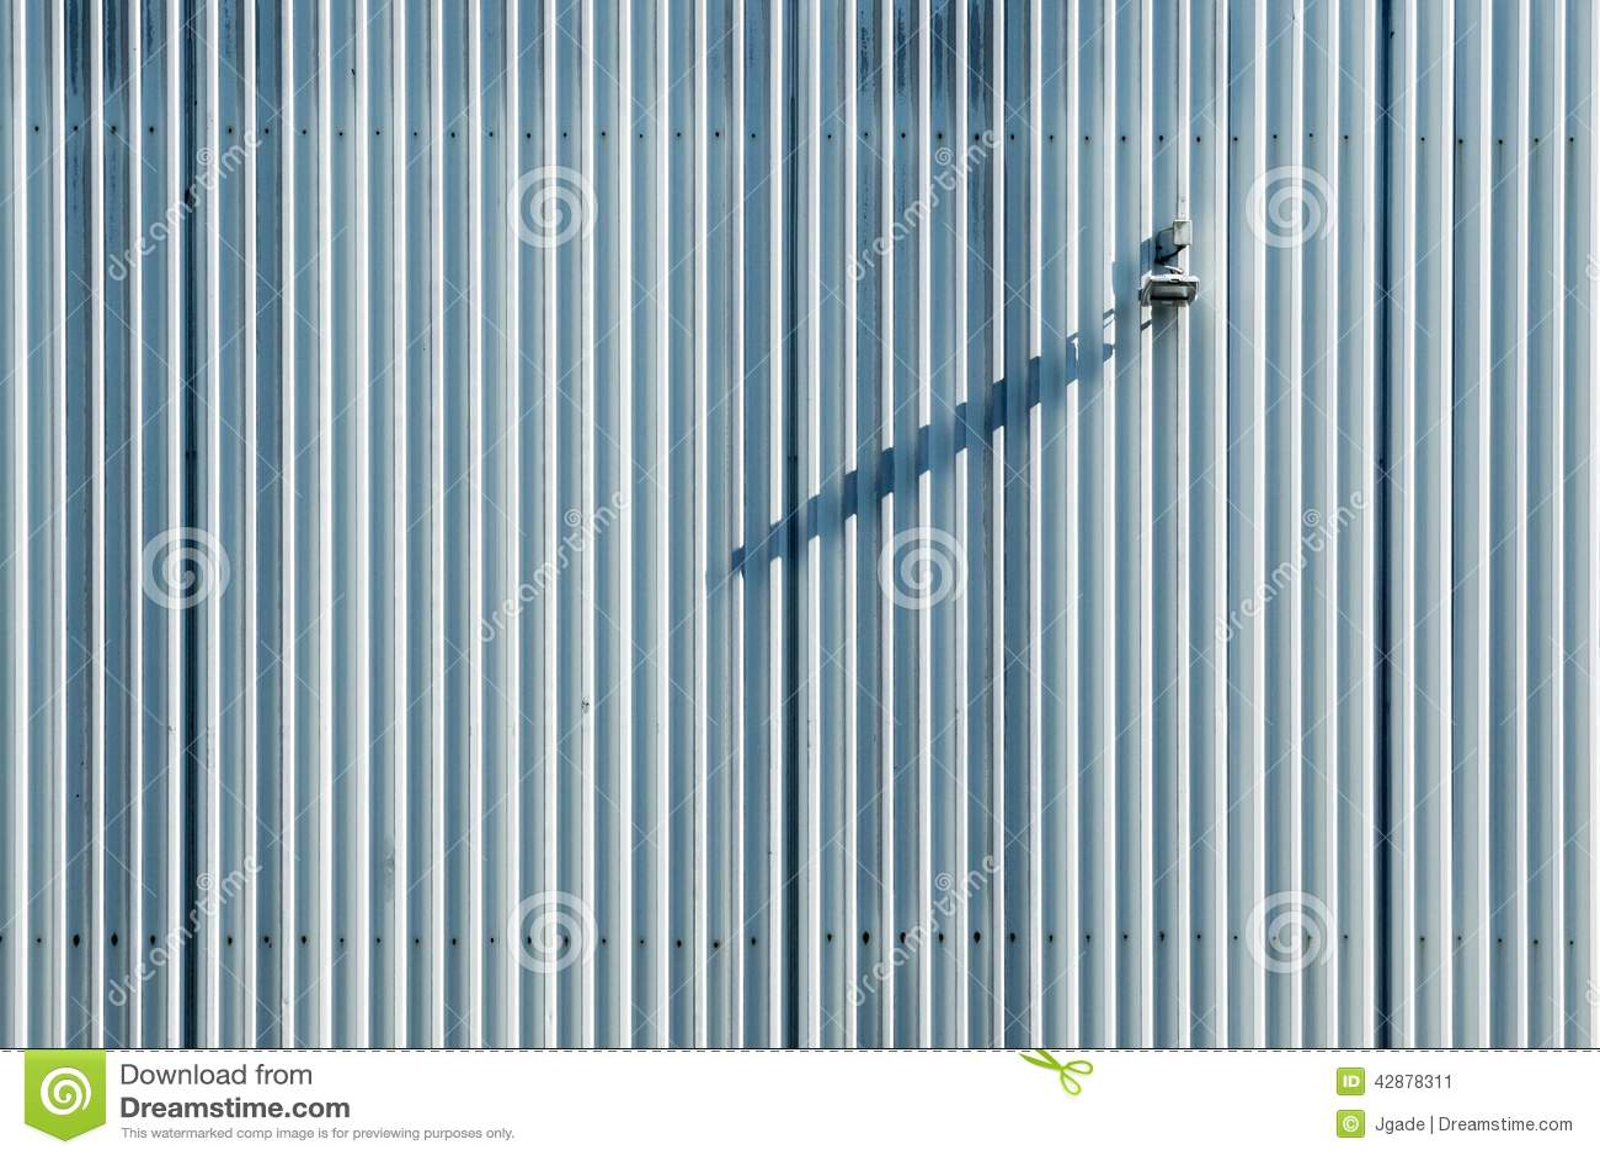 parete a strisce : Parete A Strisce Verticale Fotografia Stock - Immagine: 42878311